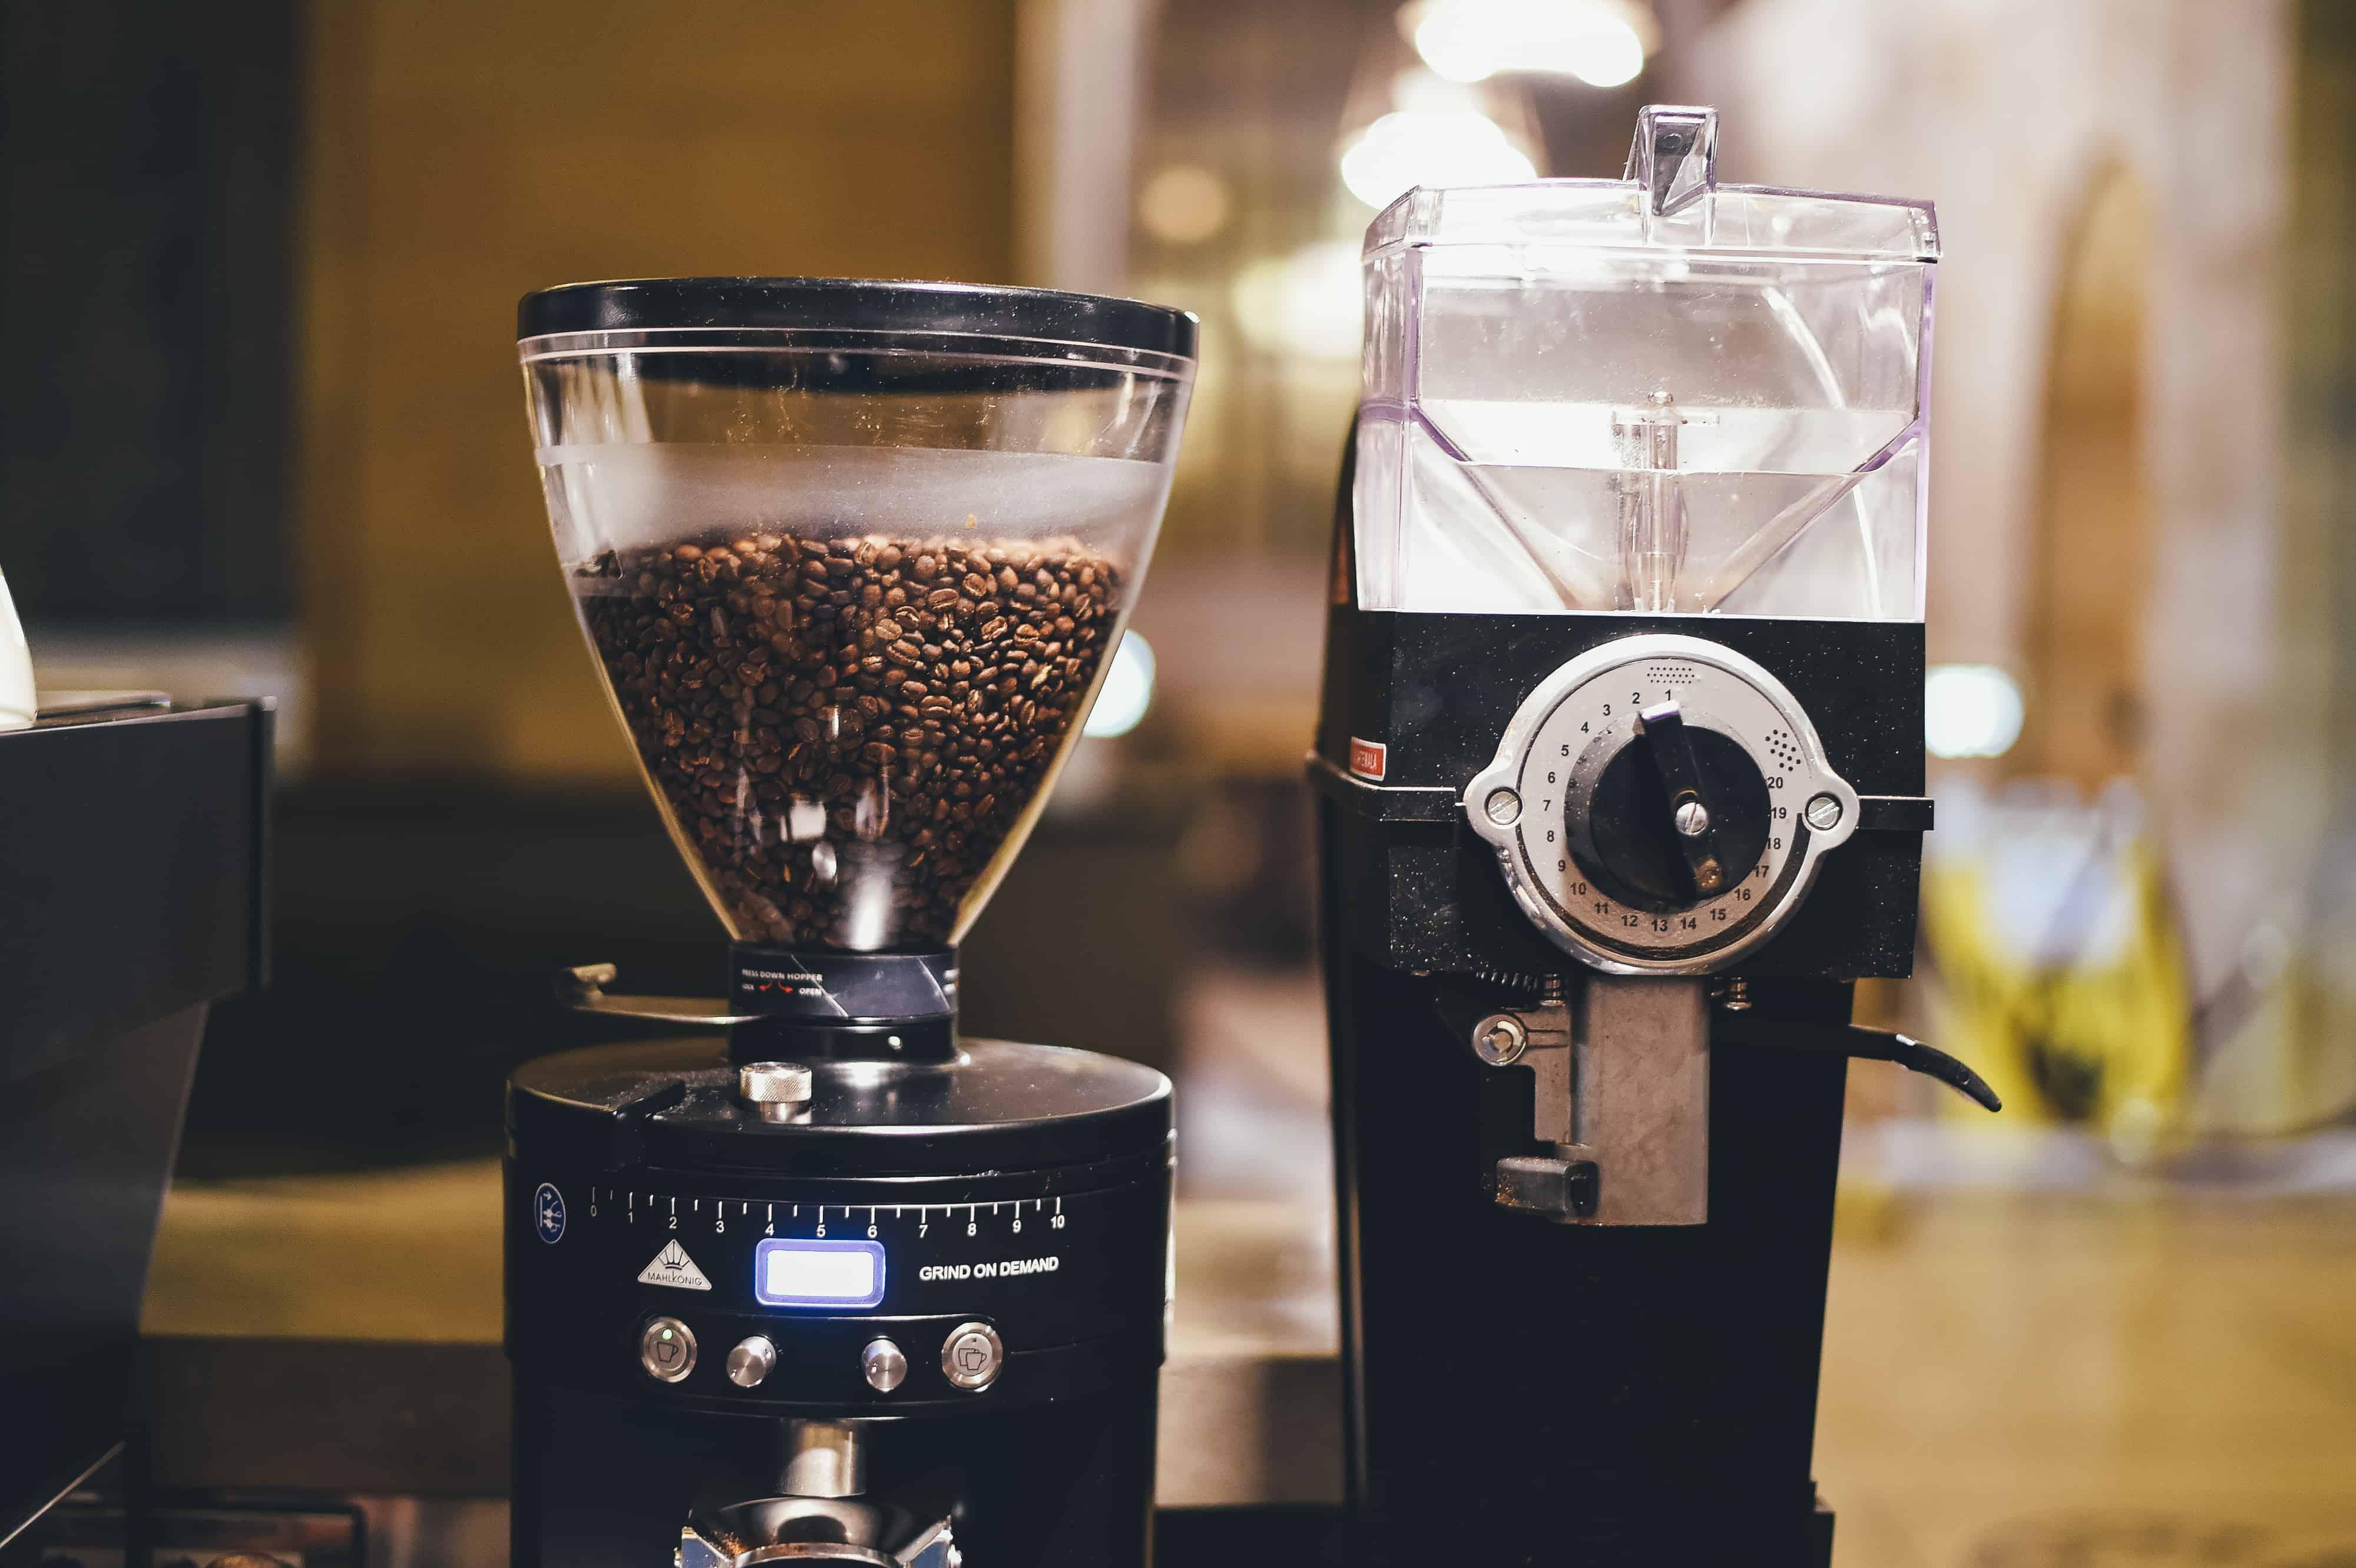 Best Natural Descaler For Coffee Makerstop 5 Solutions